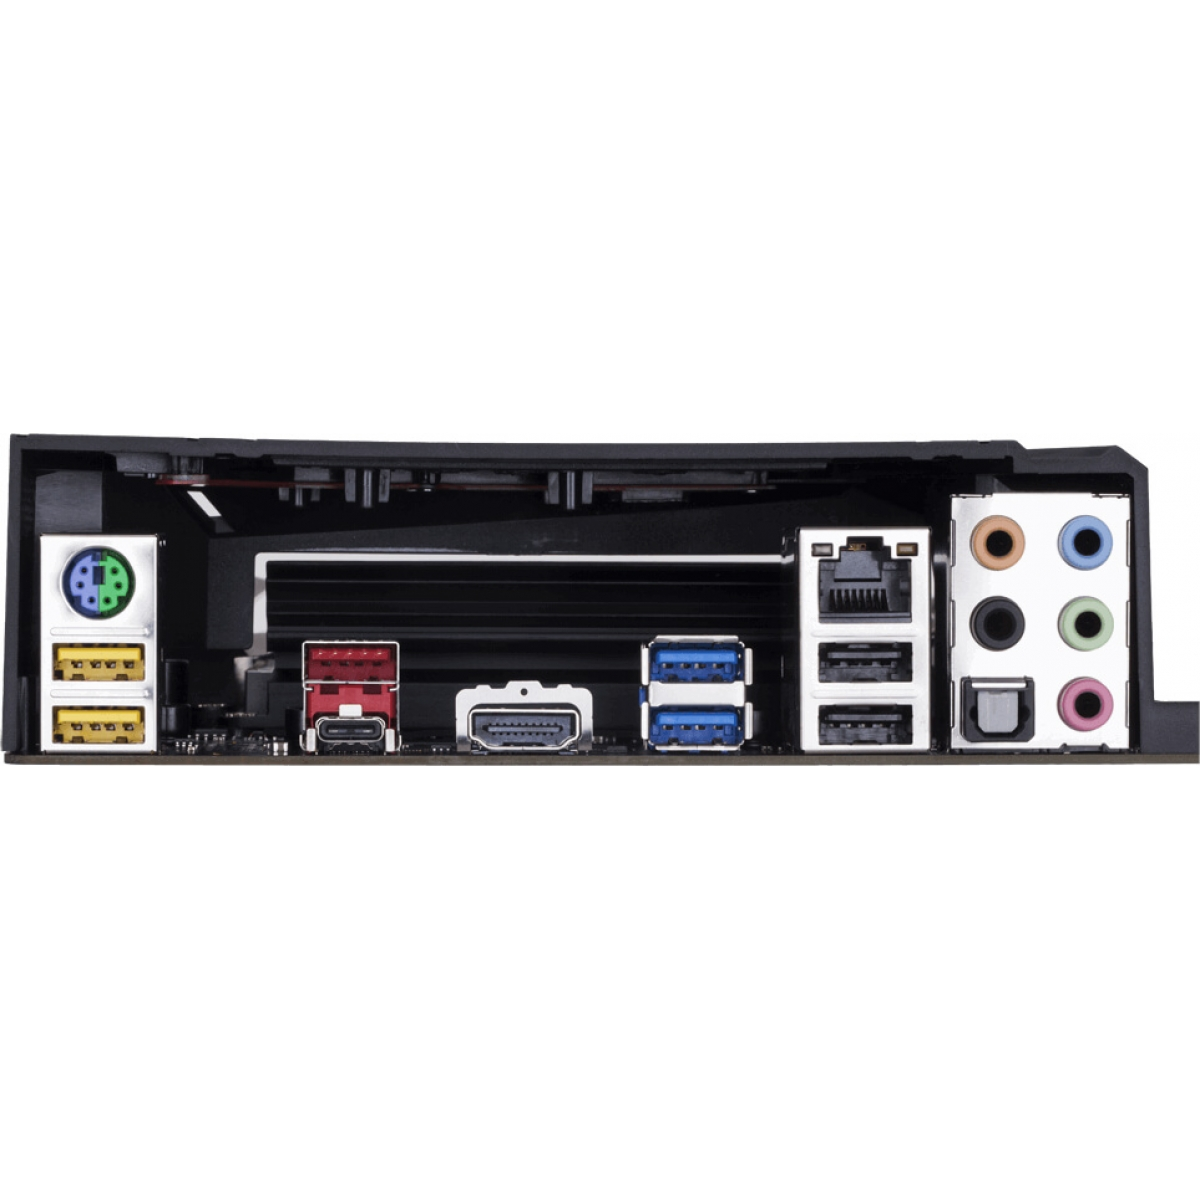 Placa Mãe Gigabyte AORUS Z370 AORUS Ultra Gaming, Chipset Z370, Intel LGA 1151, ATX, DDR4